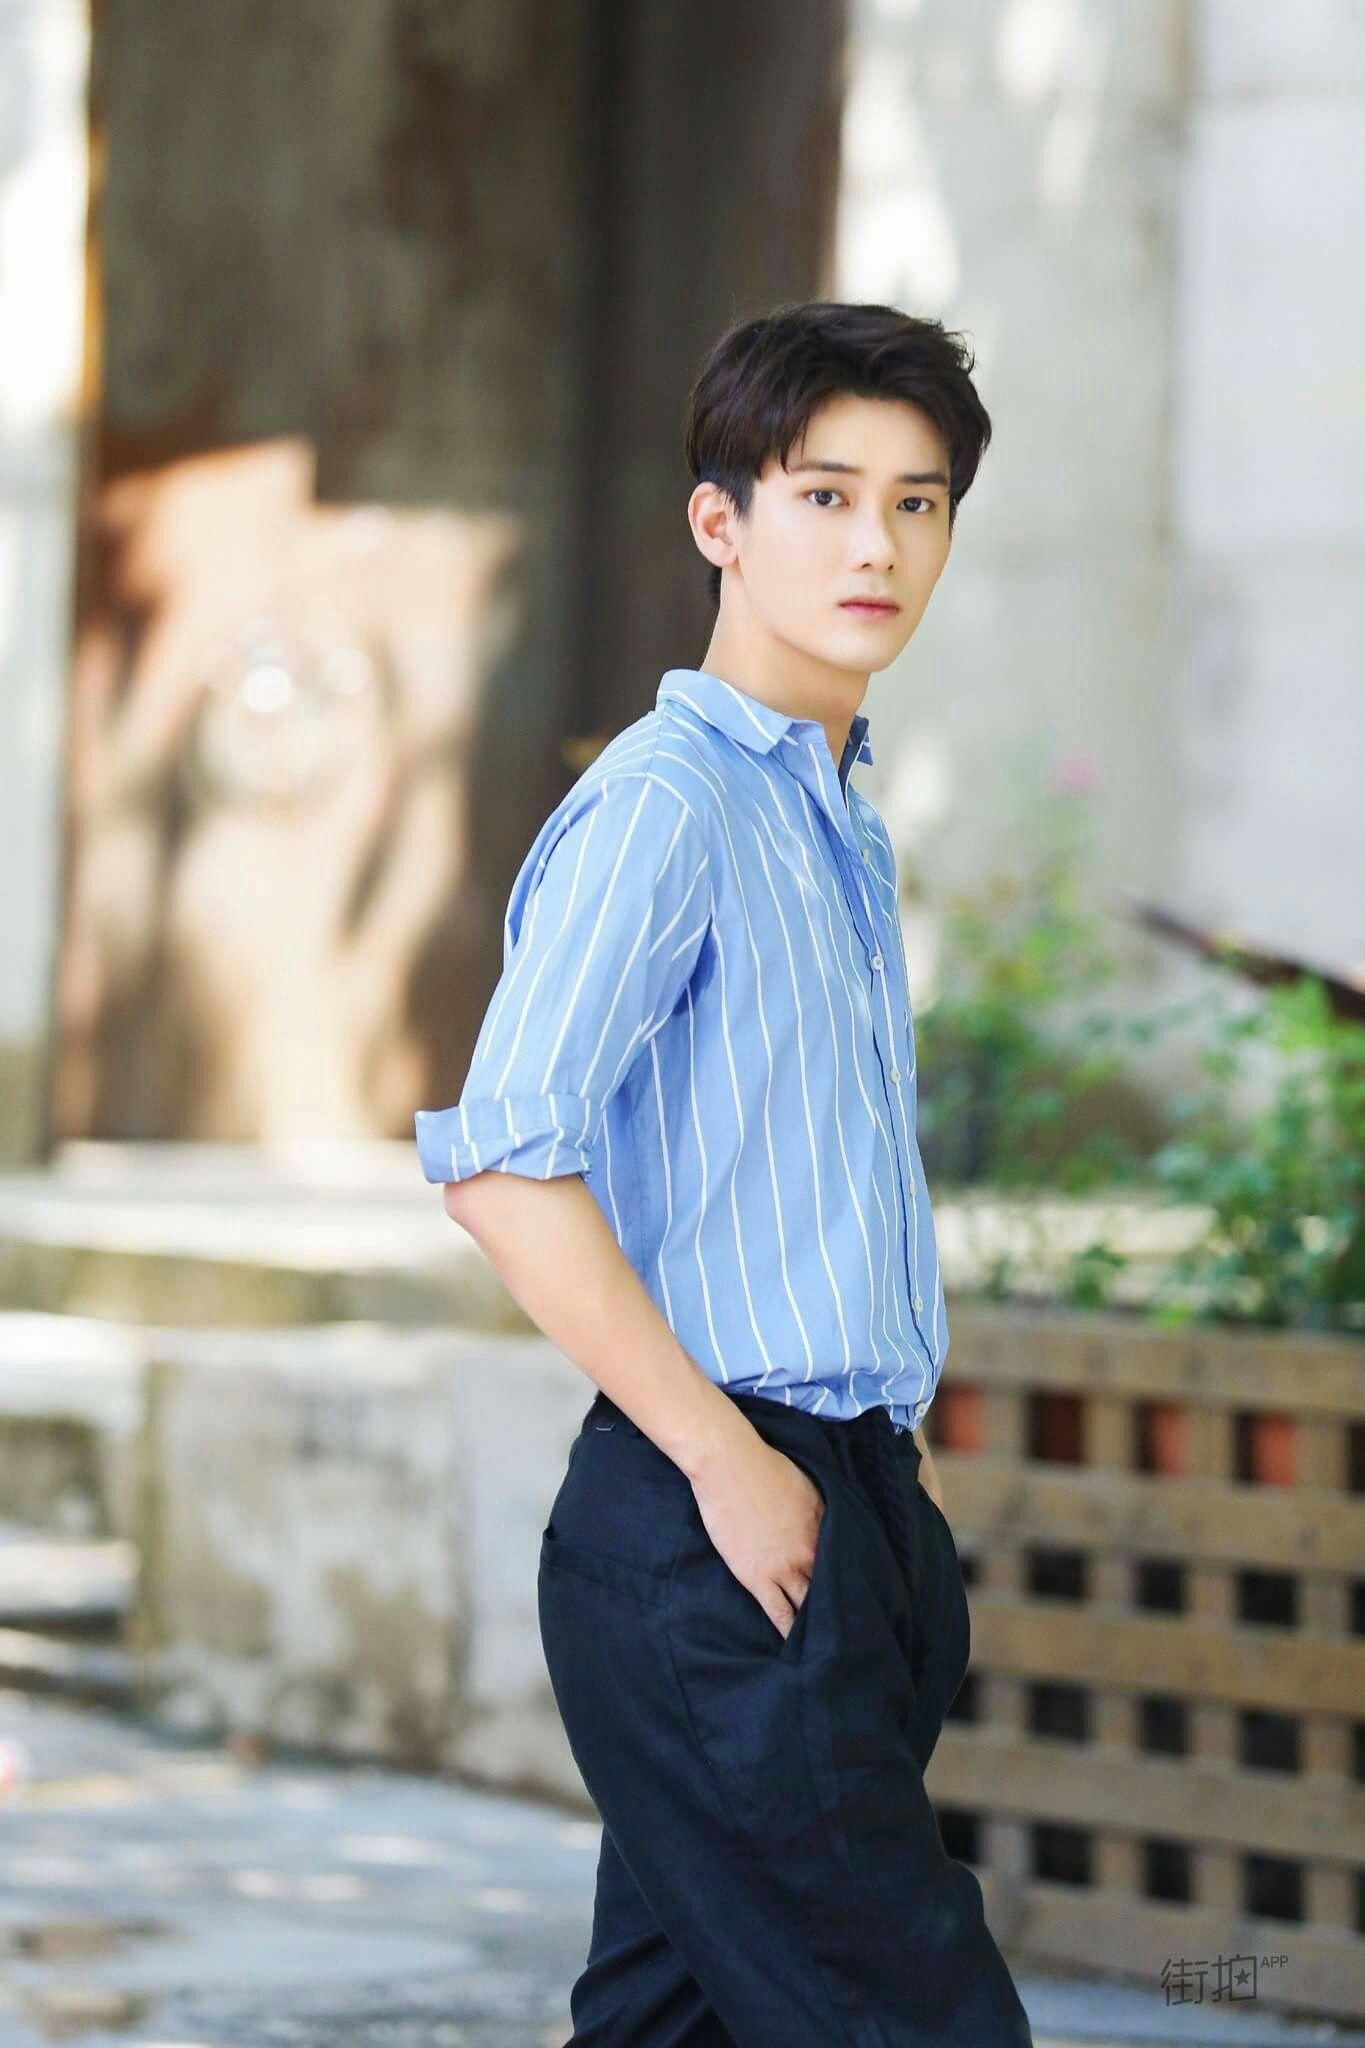 Hung Tử Kỳ Spexial 熊梓淇 Dylan Xiong Korean Celebrities Asian Actors Korean Actors